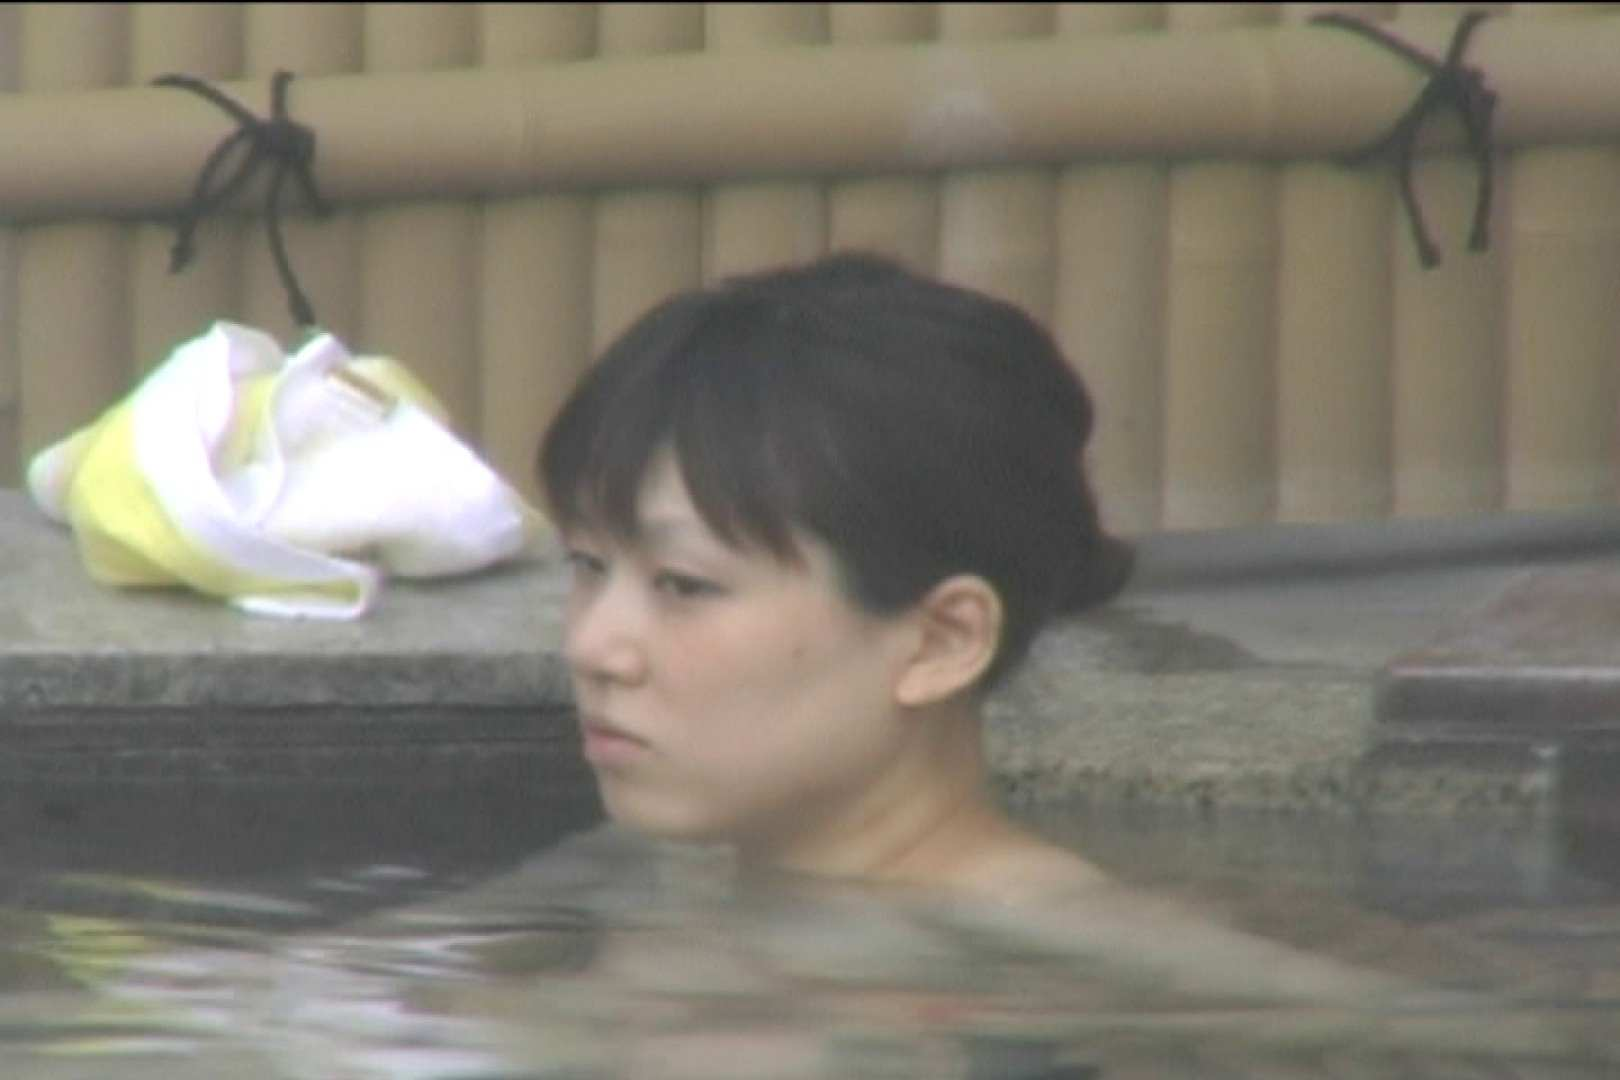 Aquaな露天風呂Vol.121 女体盗撮 隠し撮りAV無料 89連発 32